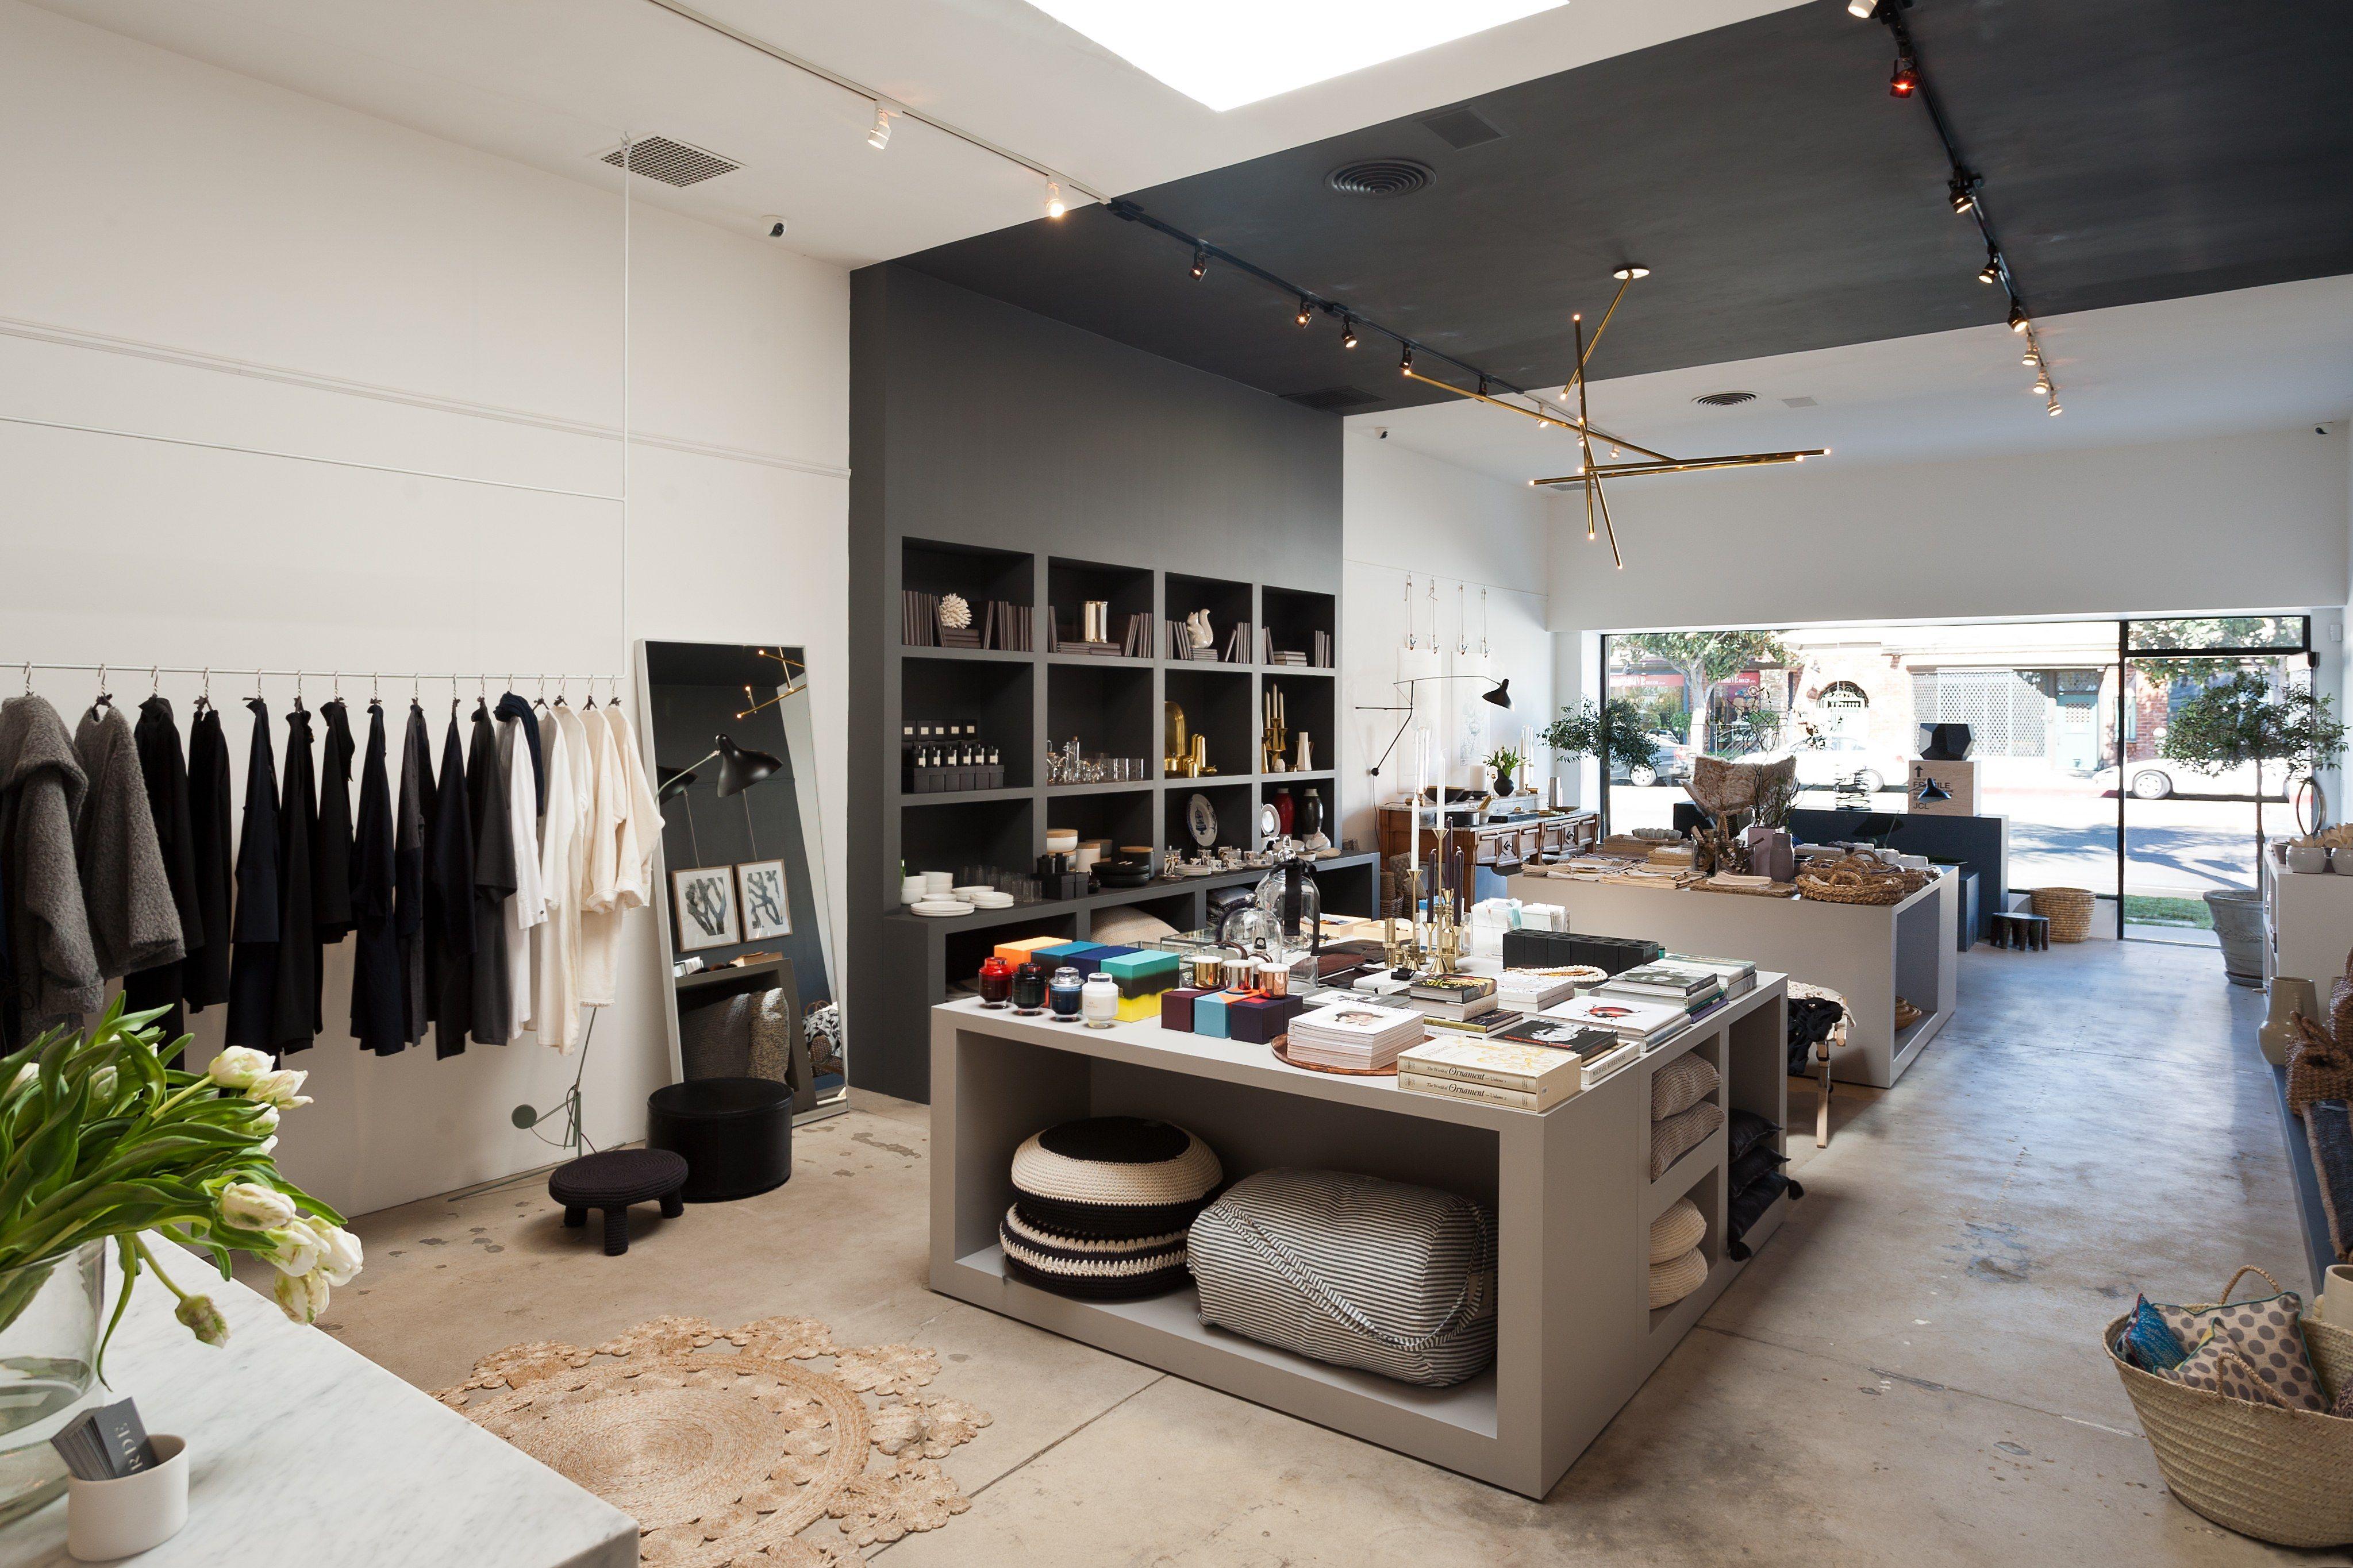 Home Decor And Design Shops Photos